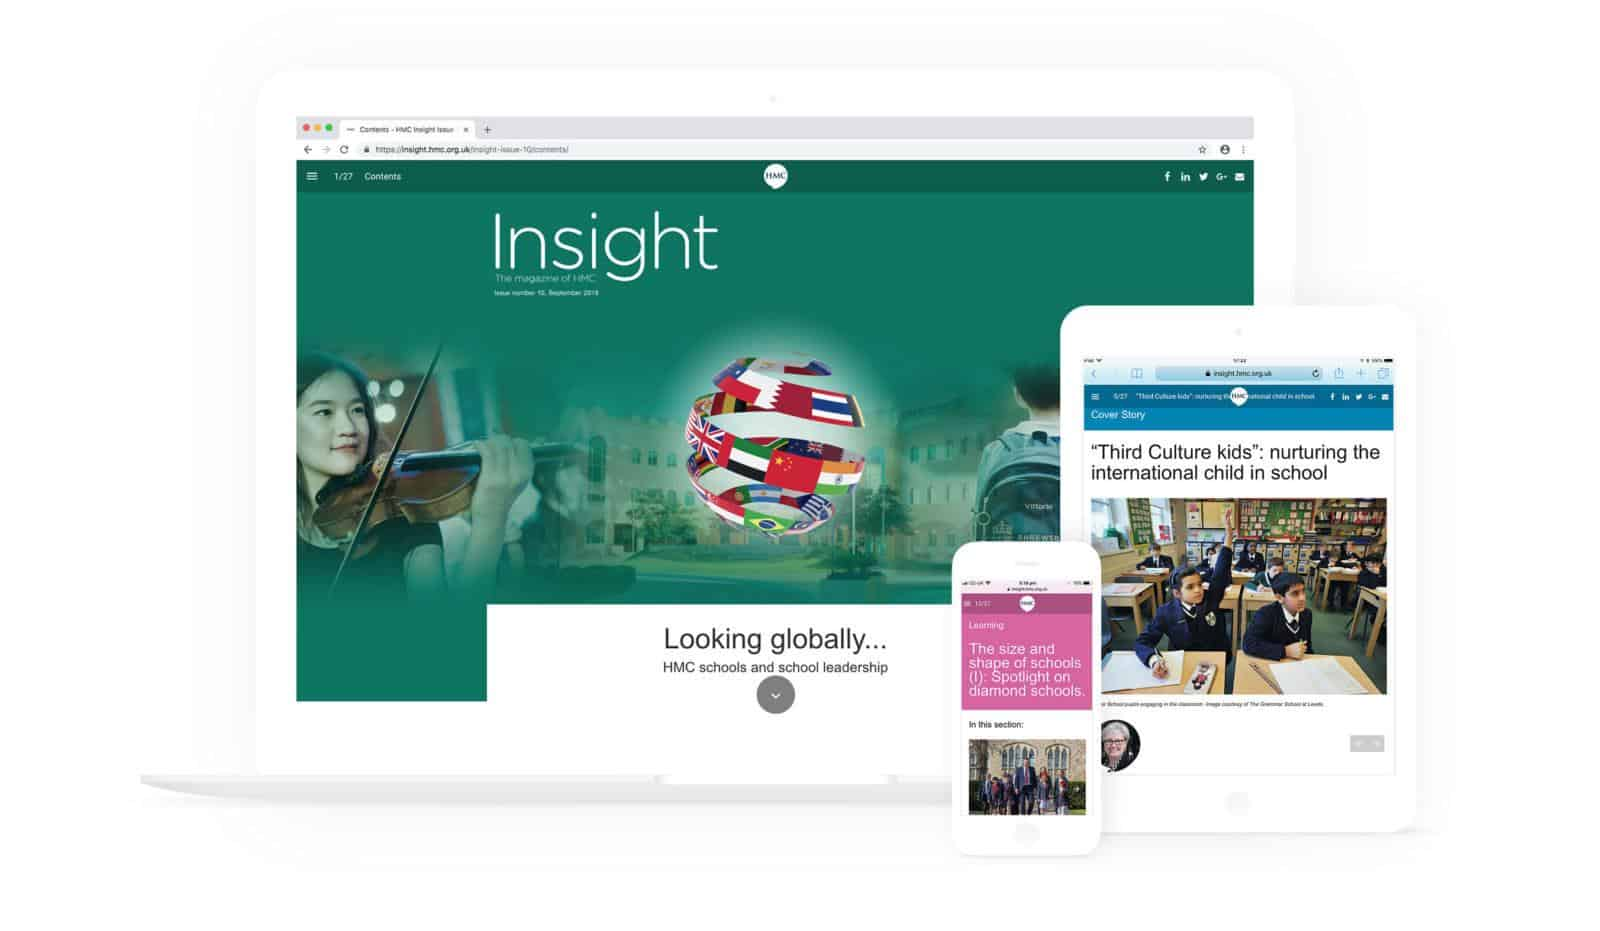 HMC Insight digital magazine